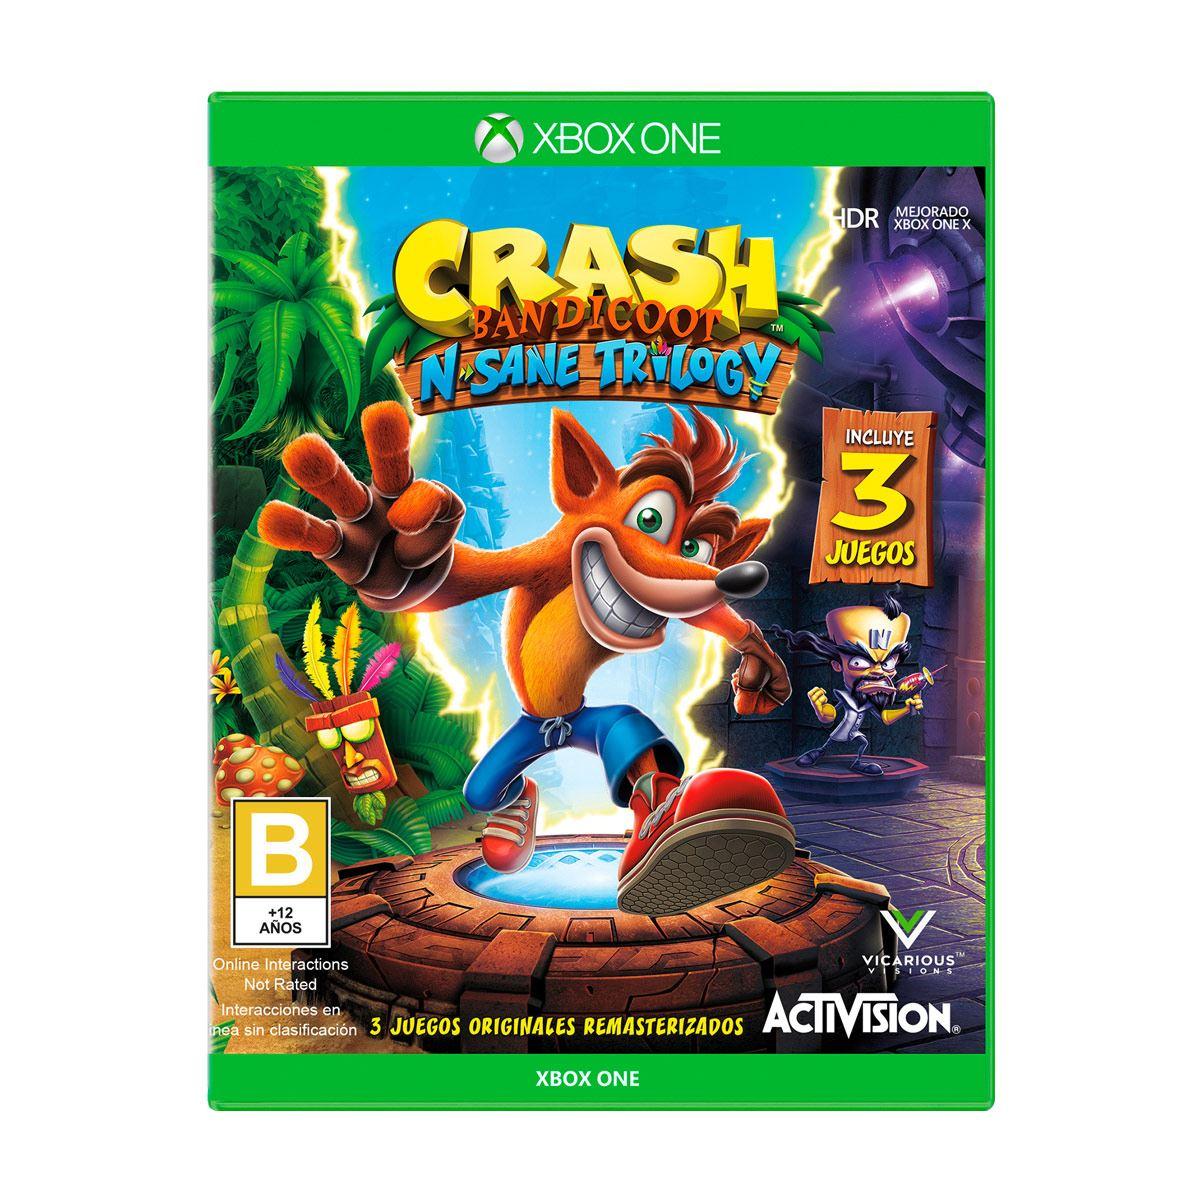 Xbox One Crash Bandicoot Trilogy